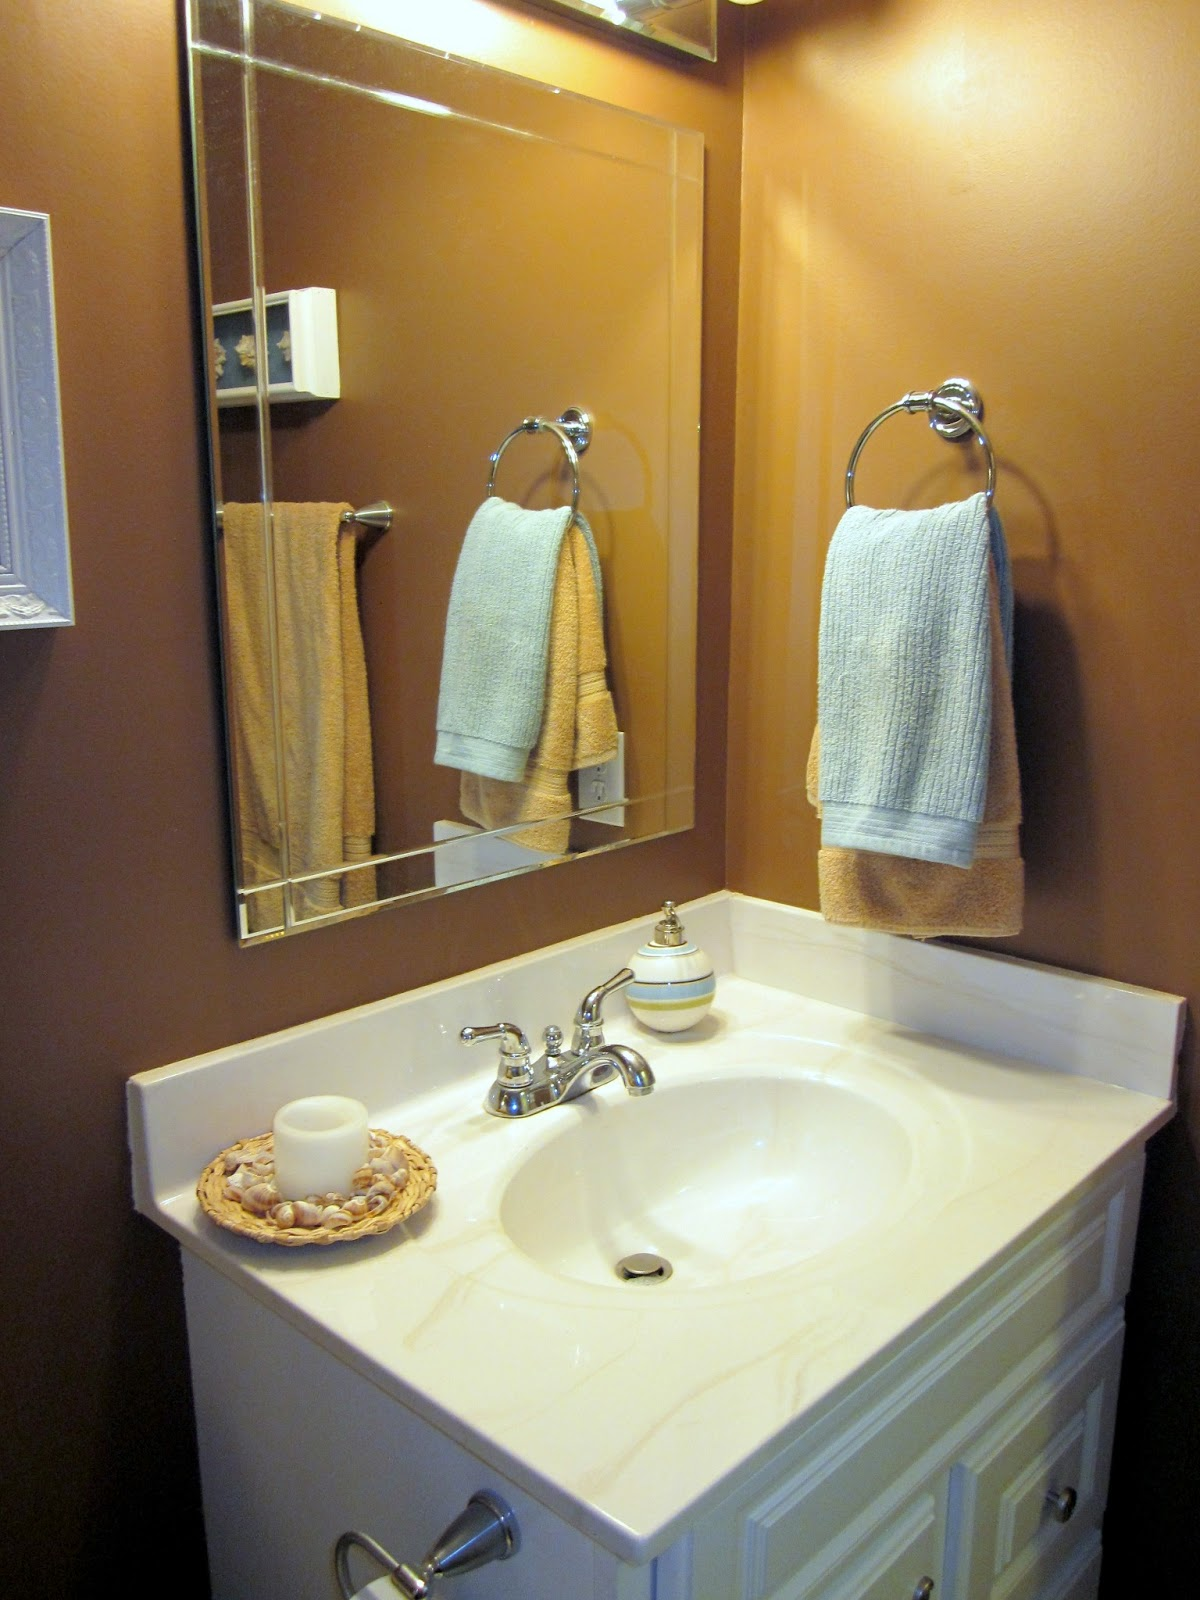 A peachtree city life bathroom upgrade rainwashed for Bathroom upgrades